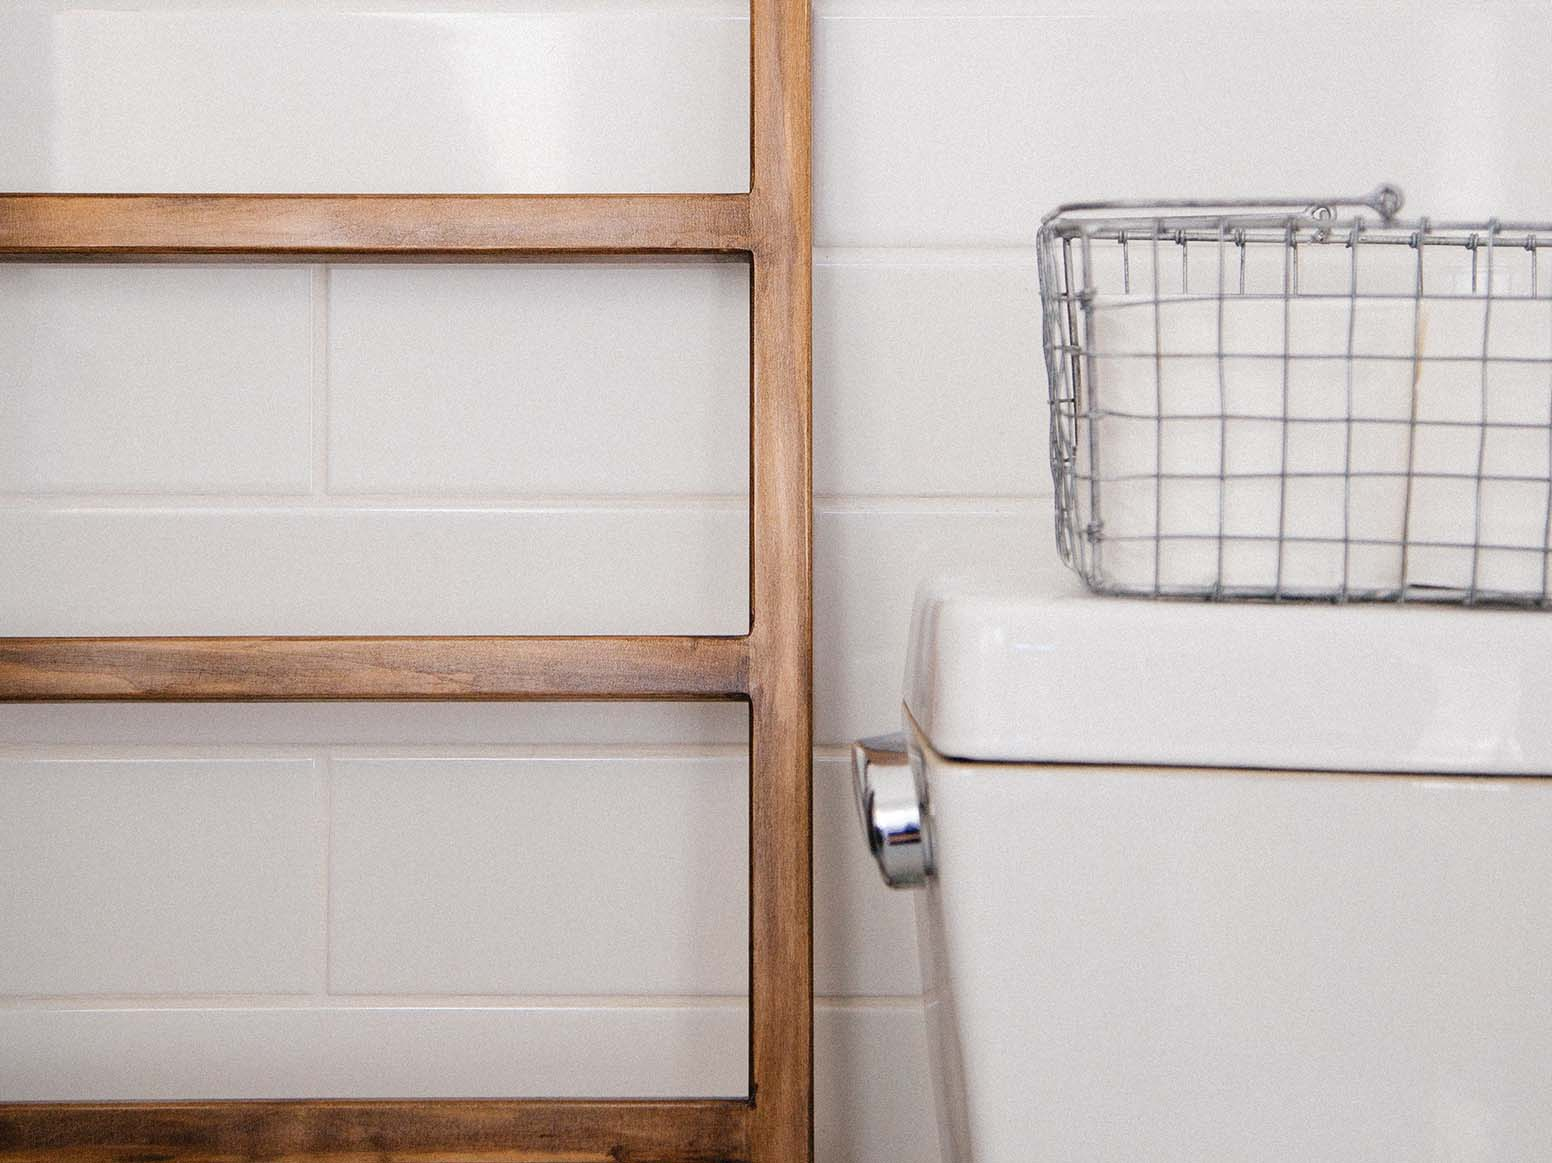 Toilet Cleaner -